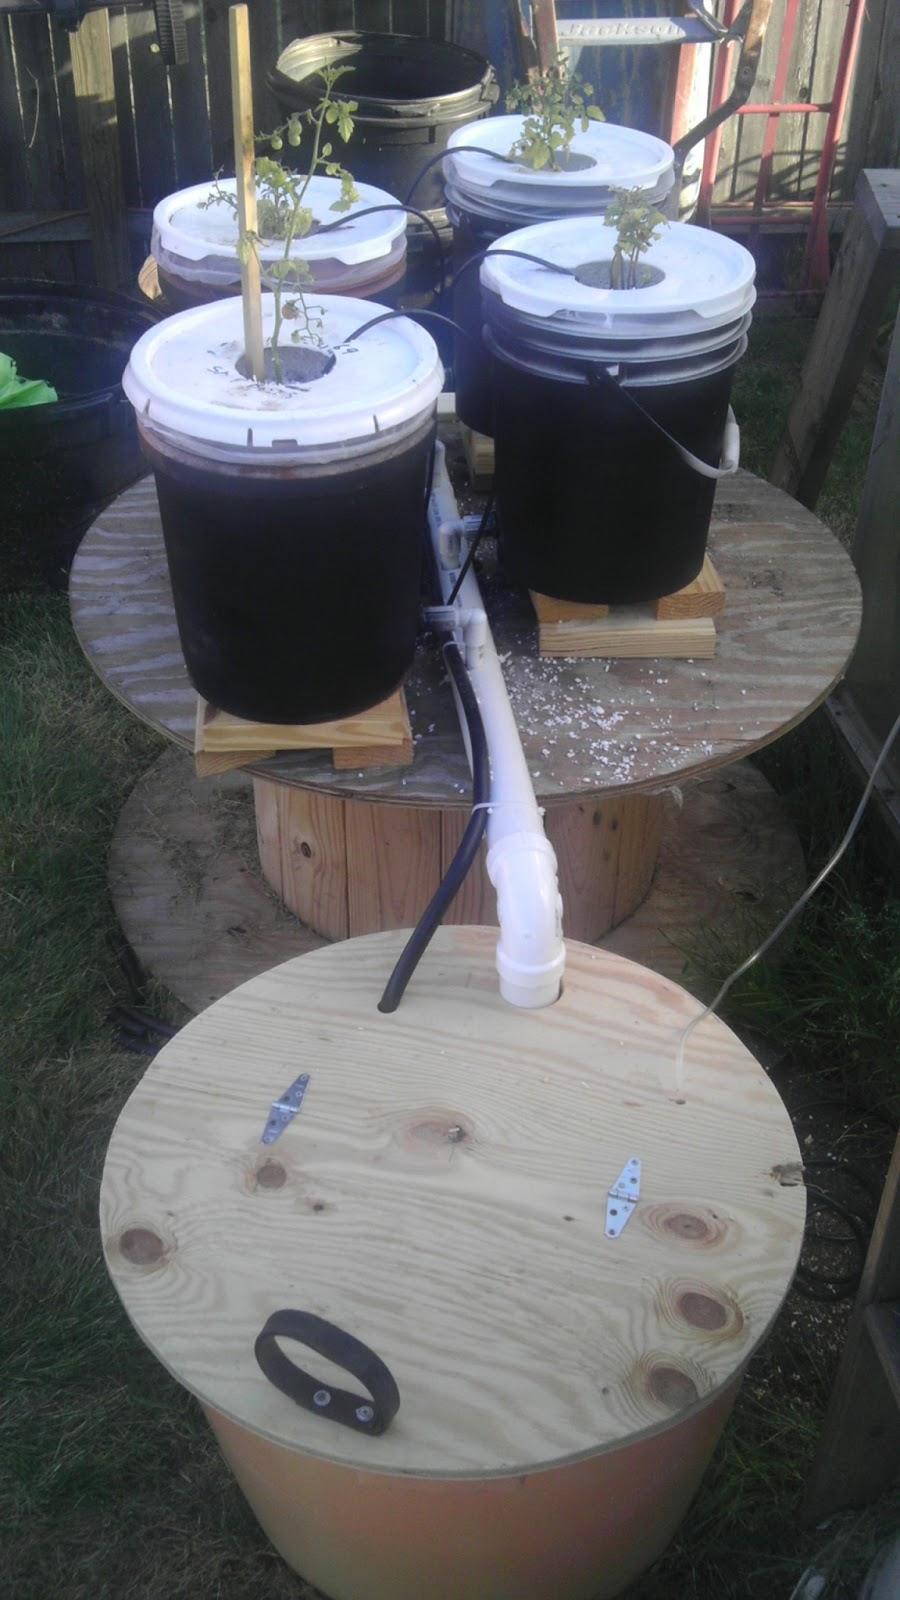 Modern Day Redneck Dutch Bucket Hydroponics System